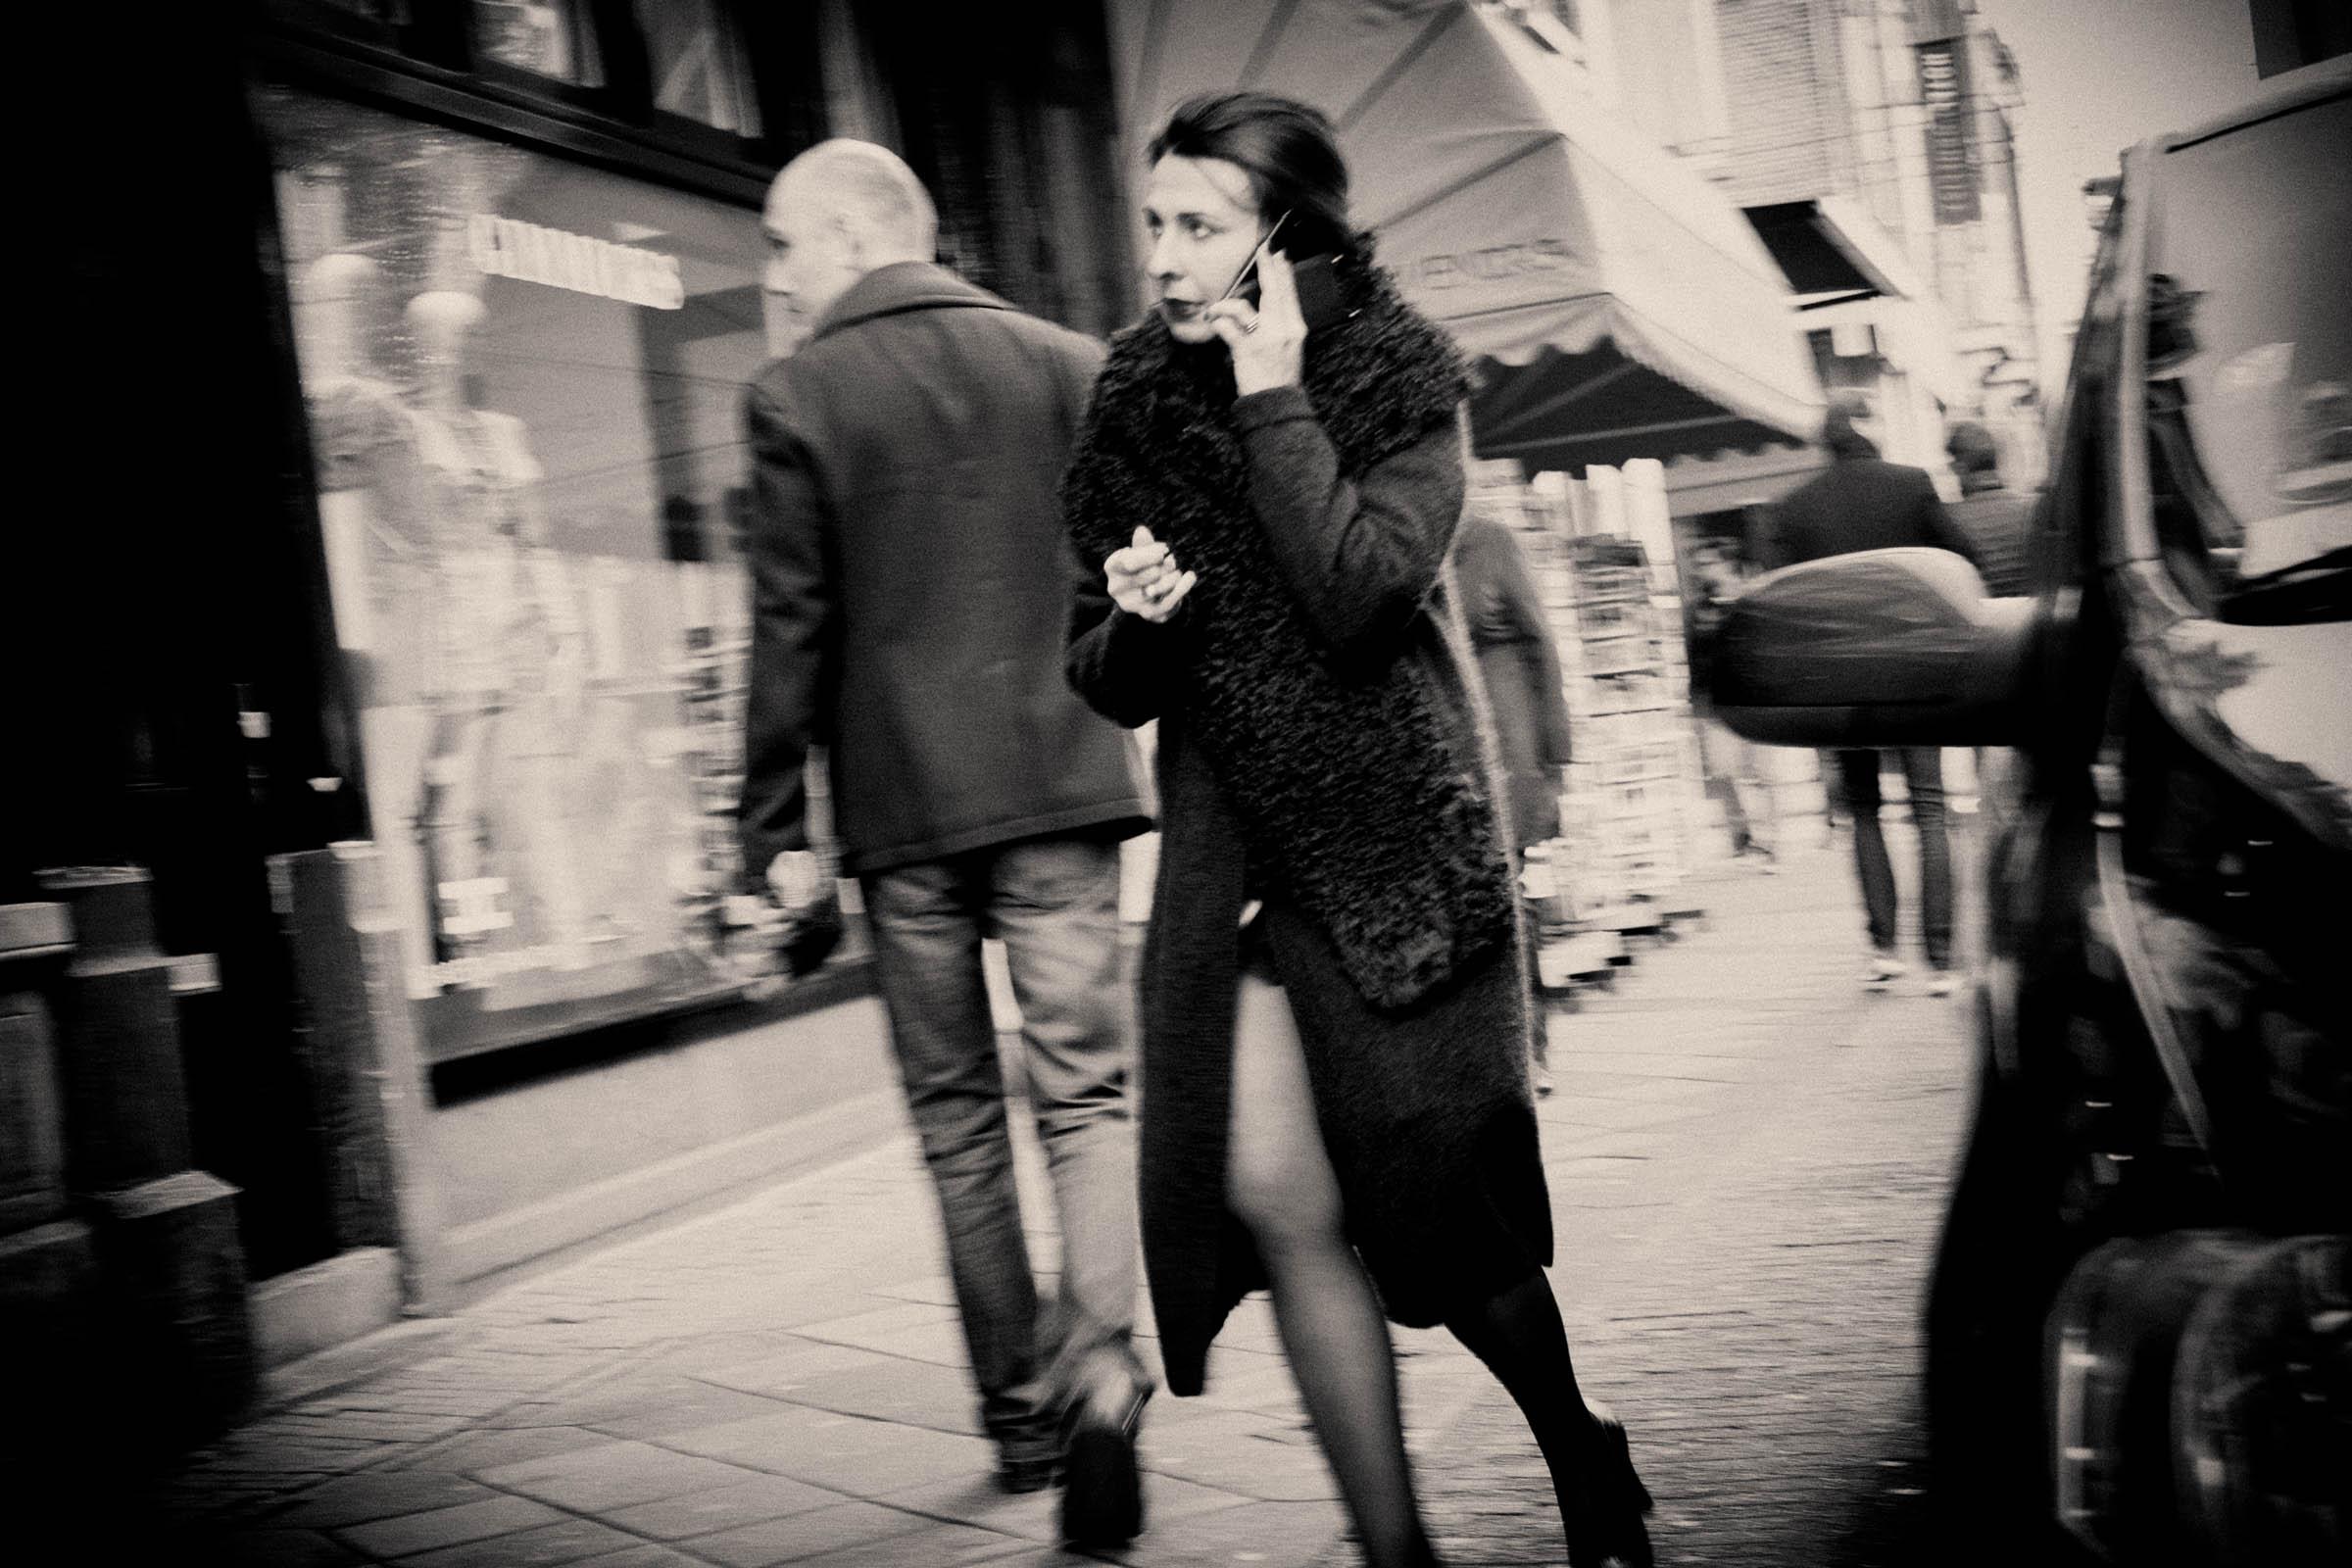 Amsterdam Madam (2014)